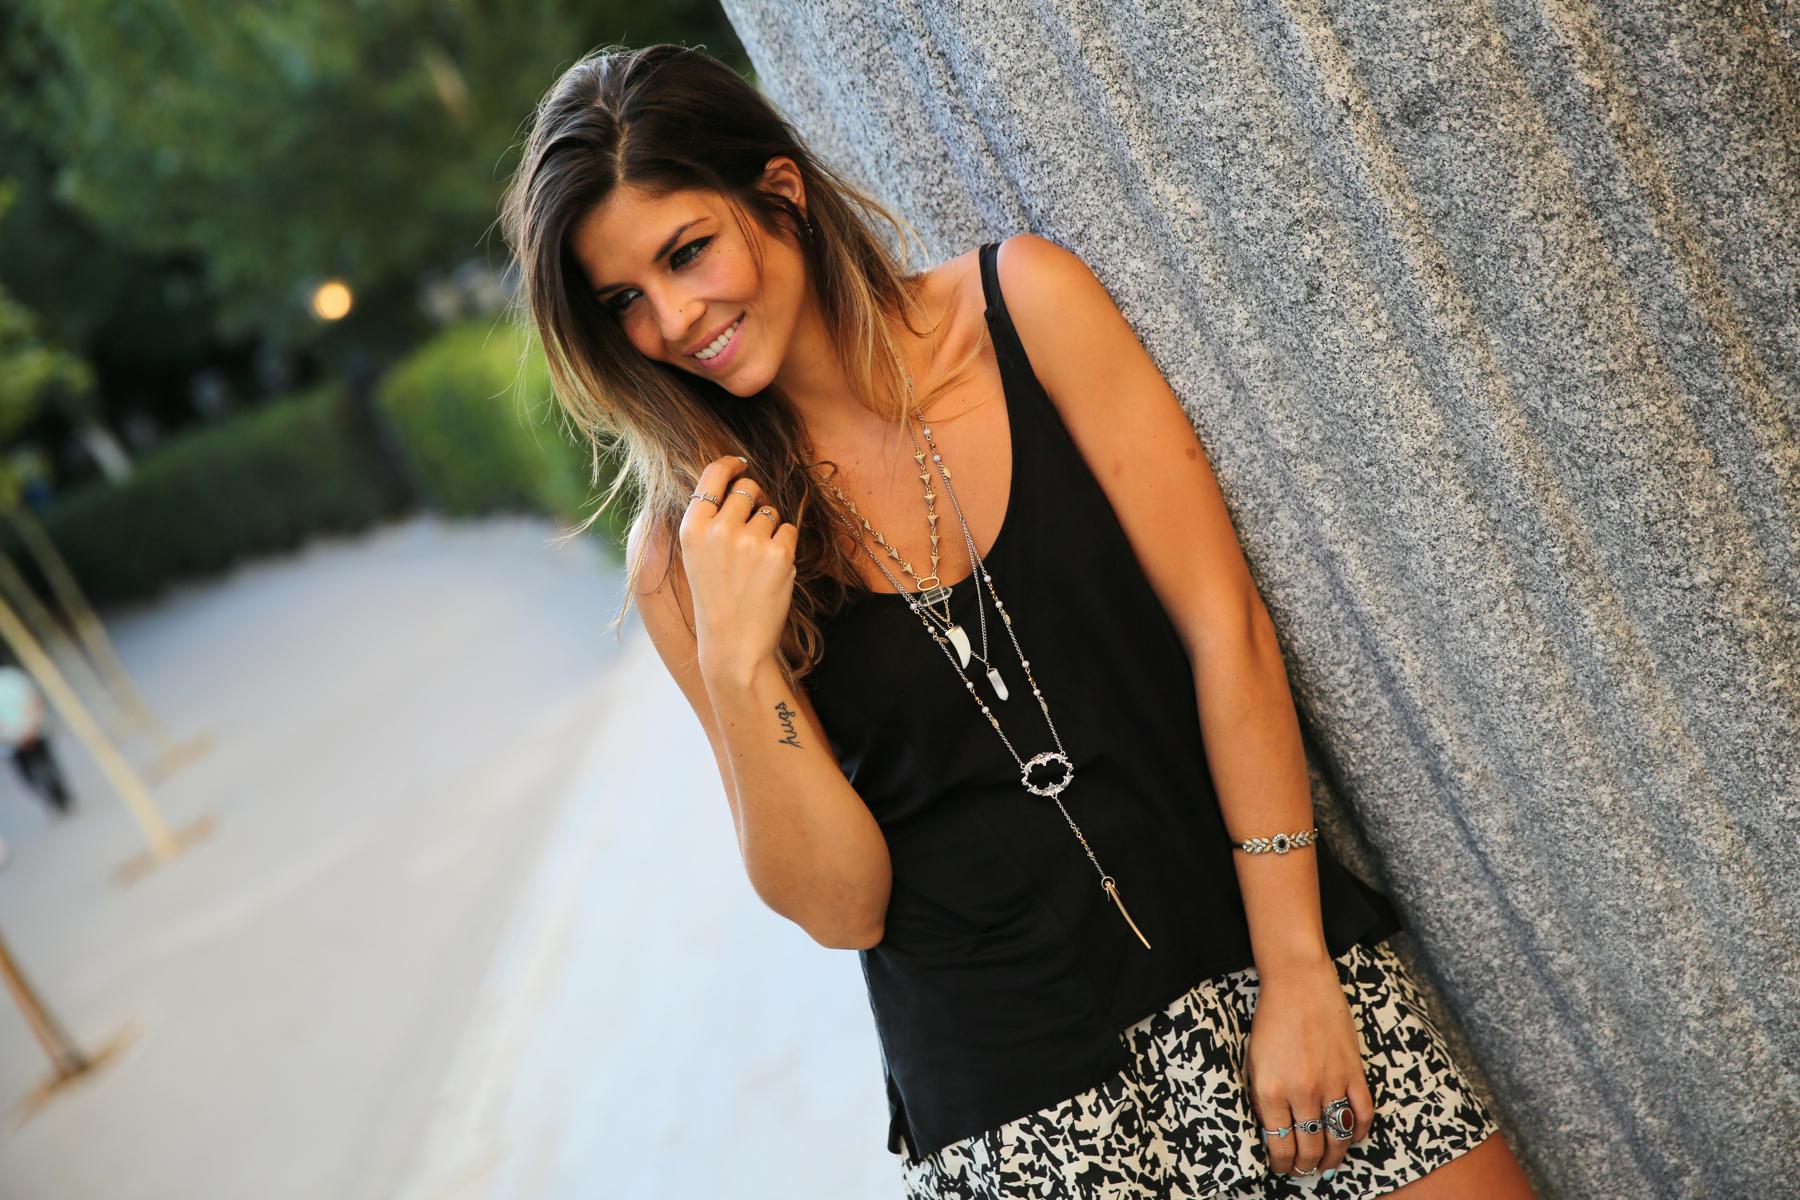 trendy_taste-look-outfit-street_style-ootd-blog-blogger-fashion_spain-moda_españa-animal_print-boho-casual-falda-skirt-black_booties-botines_negros-jeffrey_campbell-zara-bolso_flecos-vintage-3